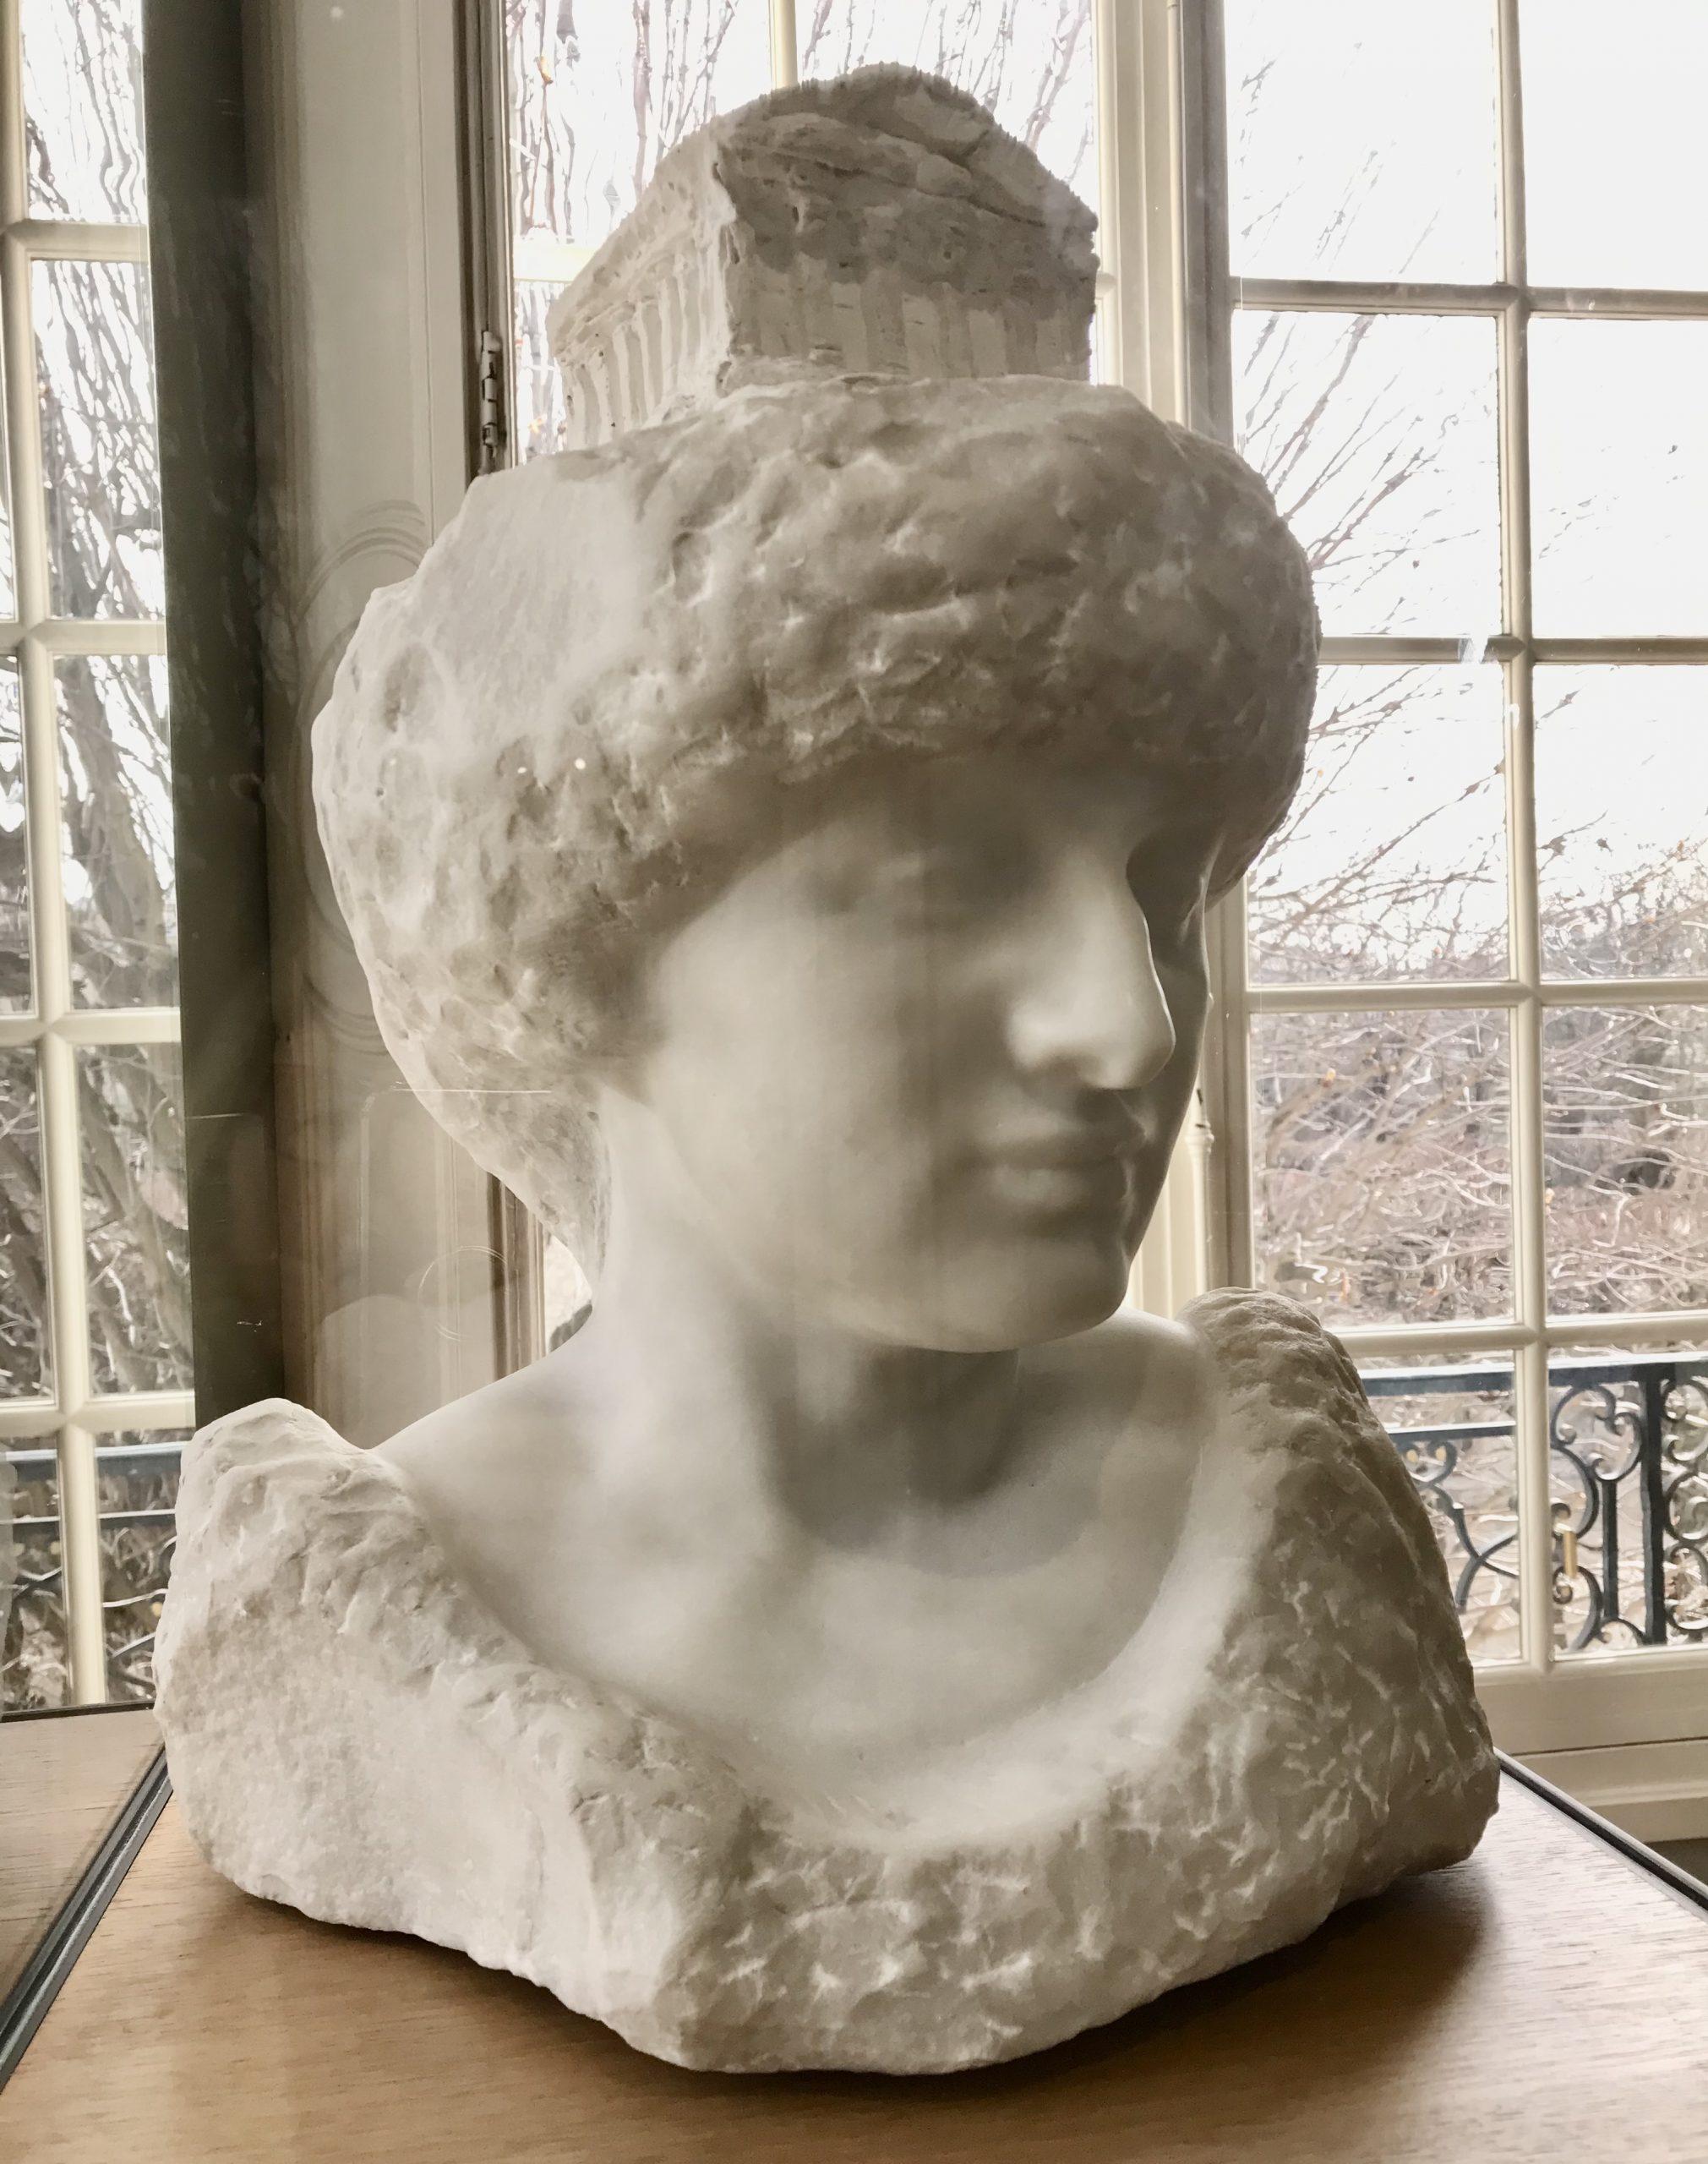 Pallas Athena with the Parthenon on her head